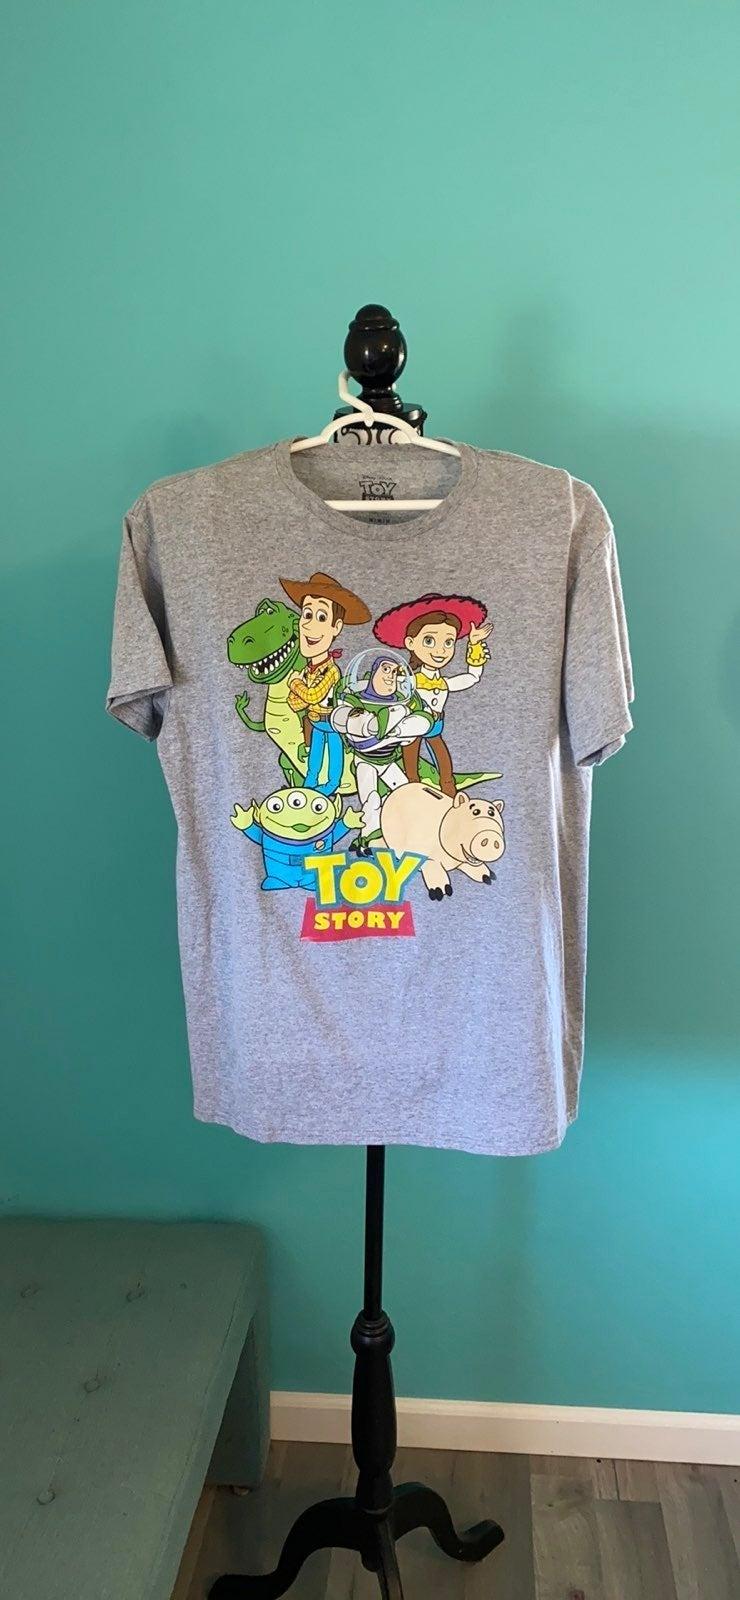 Disney Pixar Toy Story Graphic Tshirt